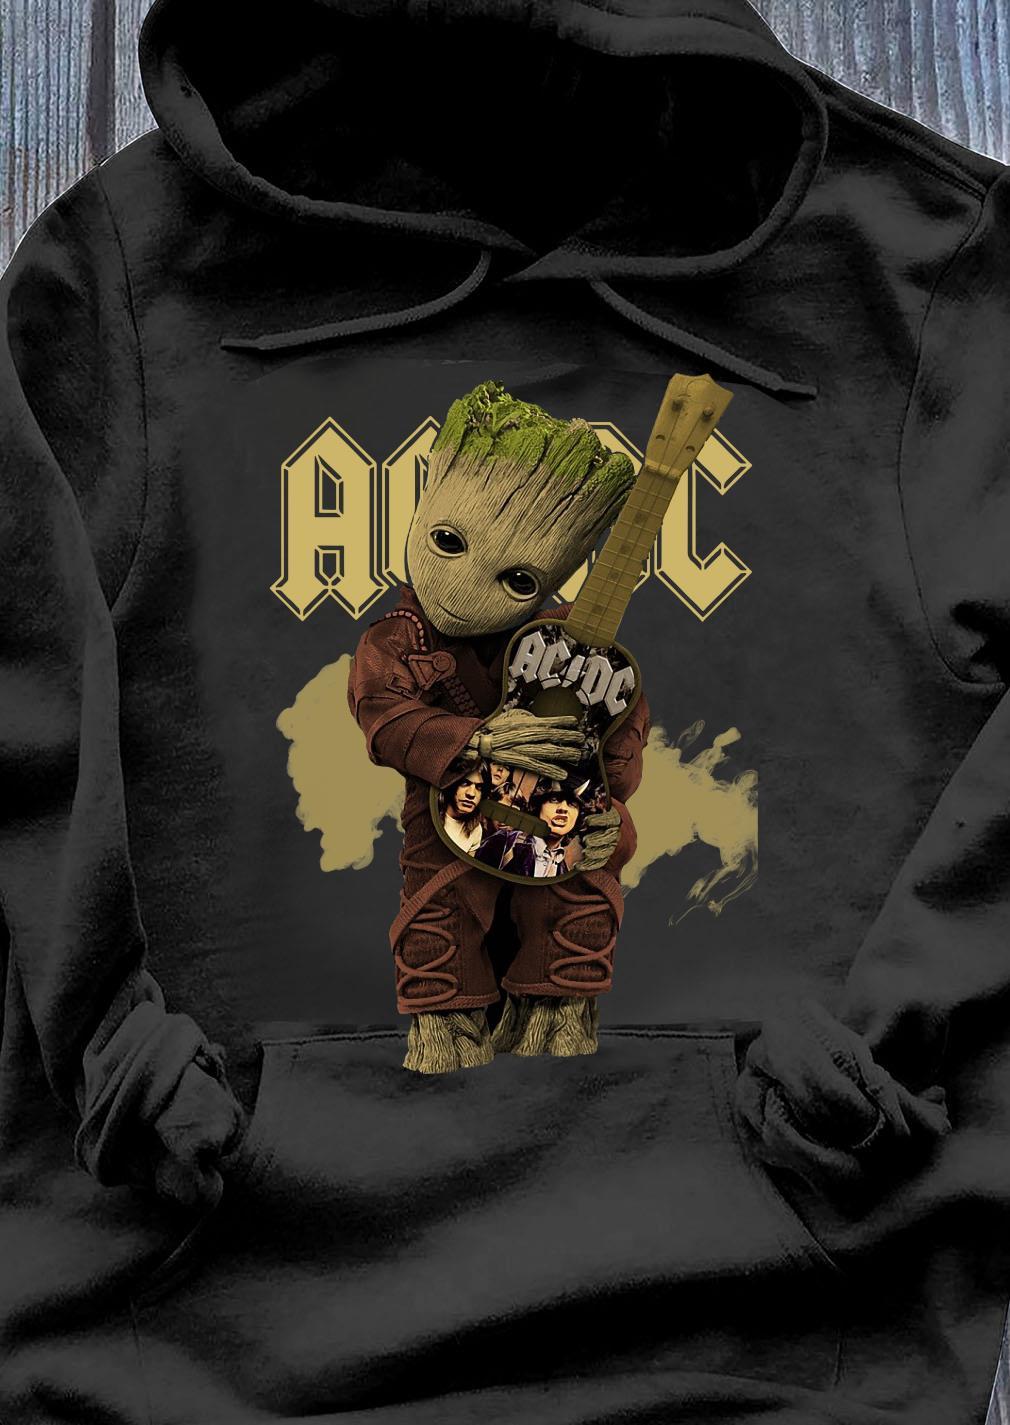 Baby Groot Hug Guitar Acdc Band Shirt Hoodie